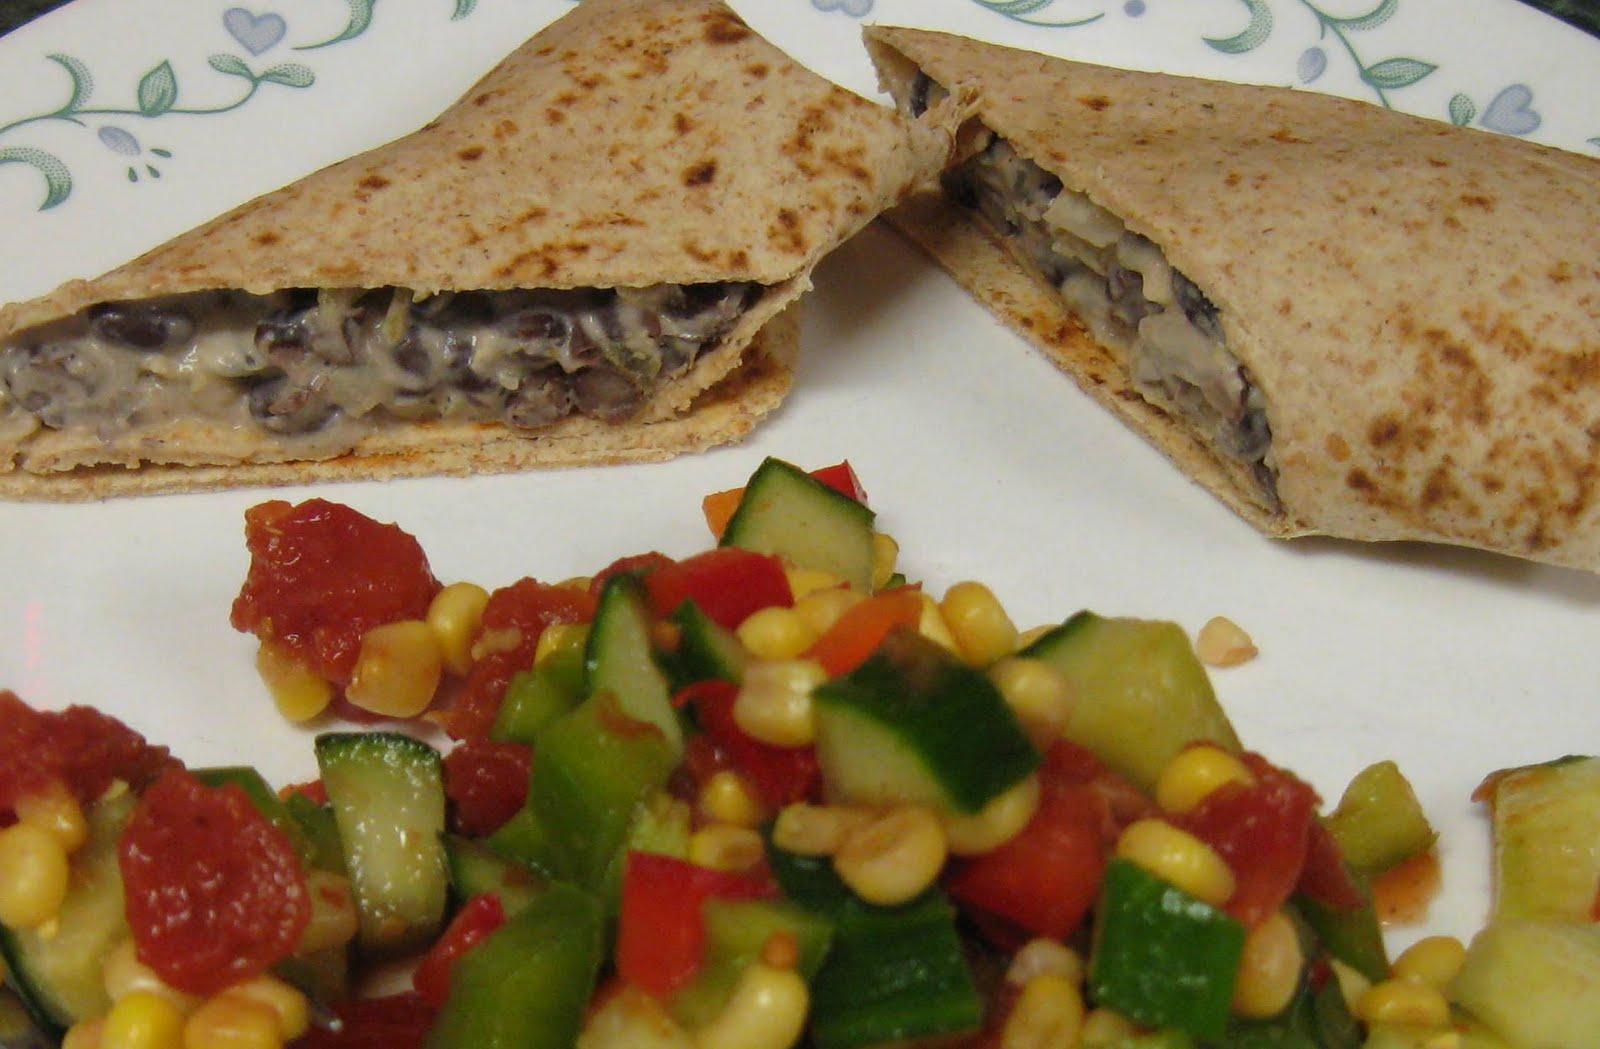 ... Dinner... Healthy & Low Calorie: Black Bean & Cream Cheese Burritos